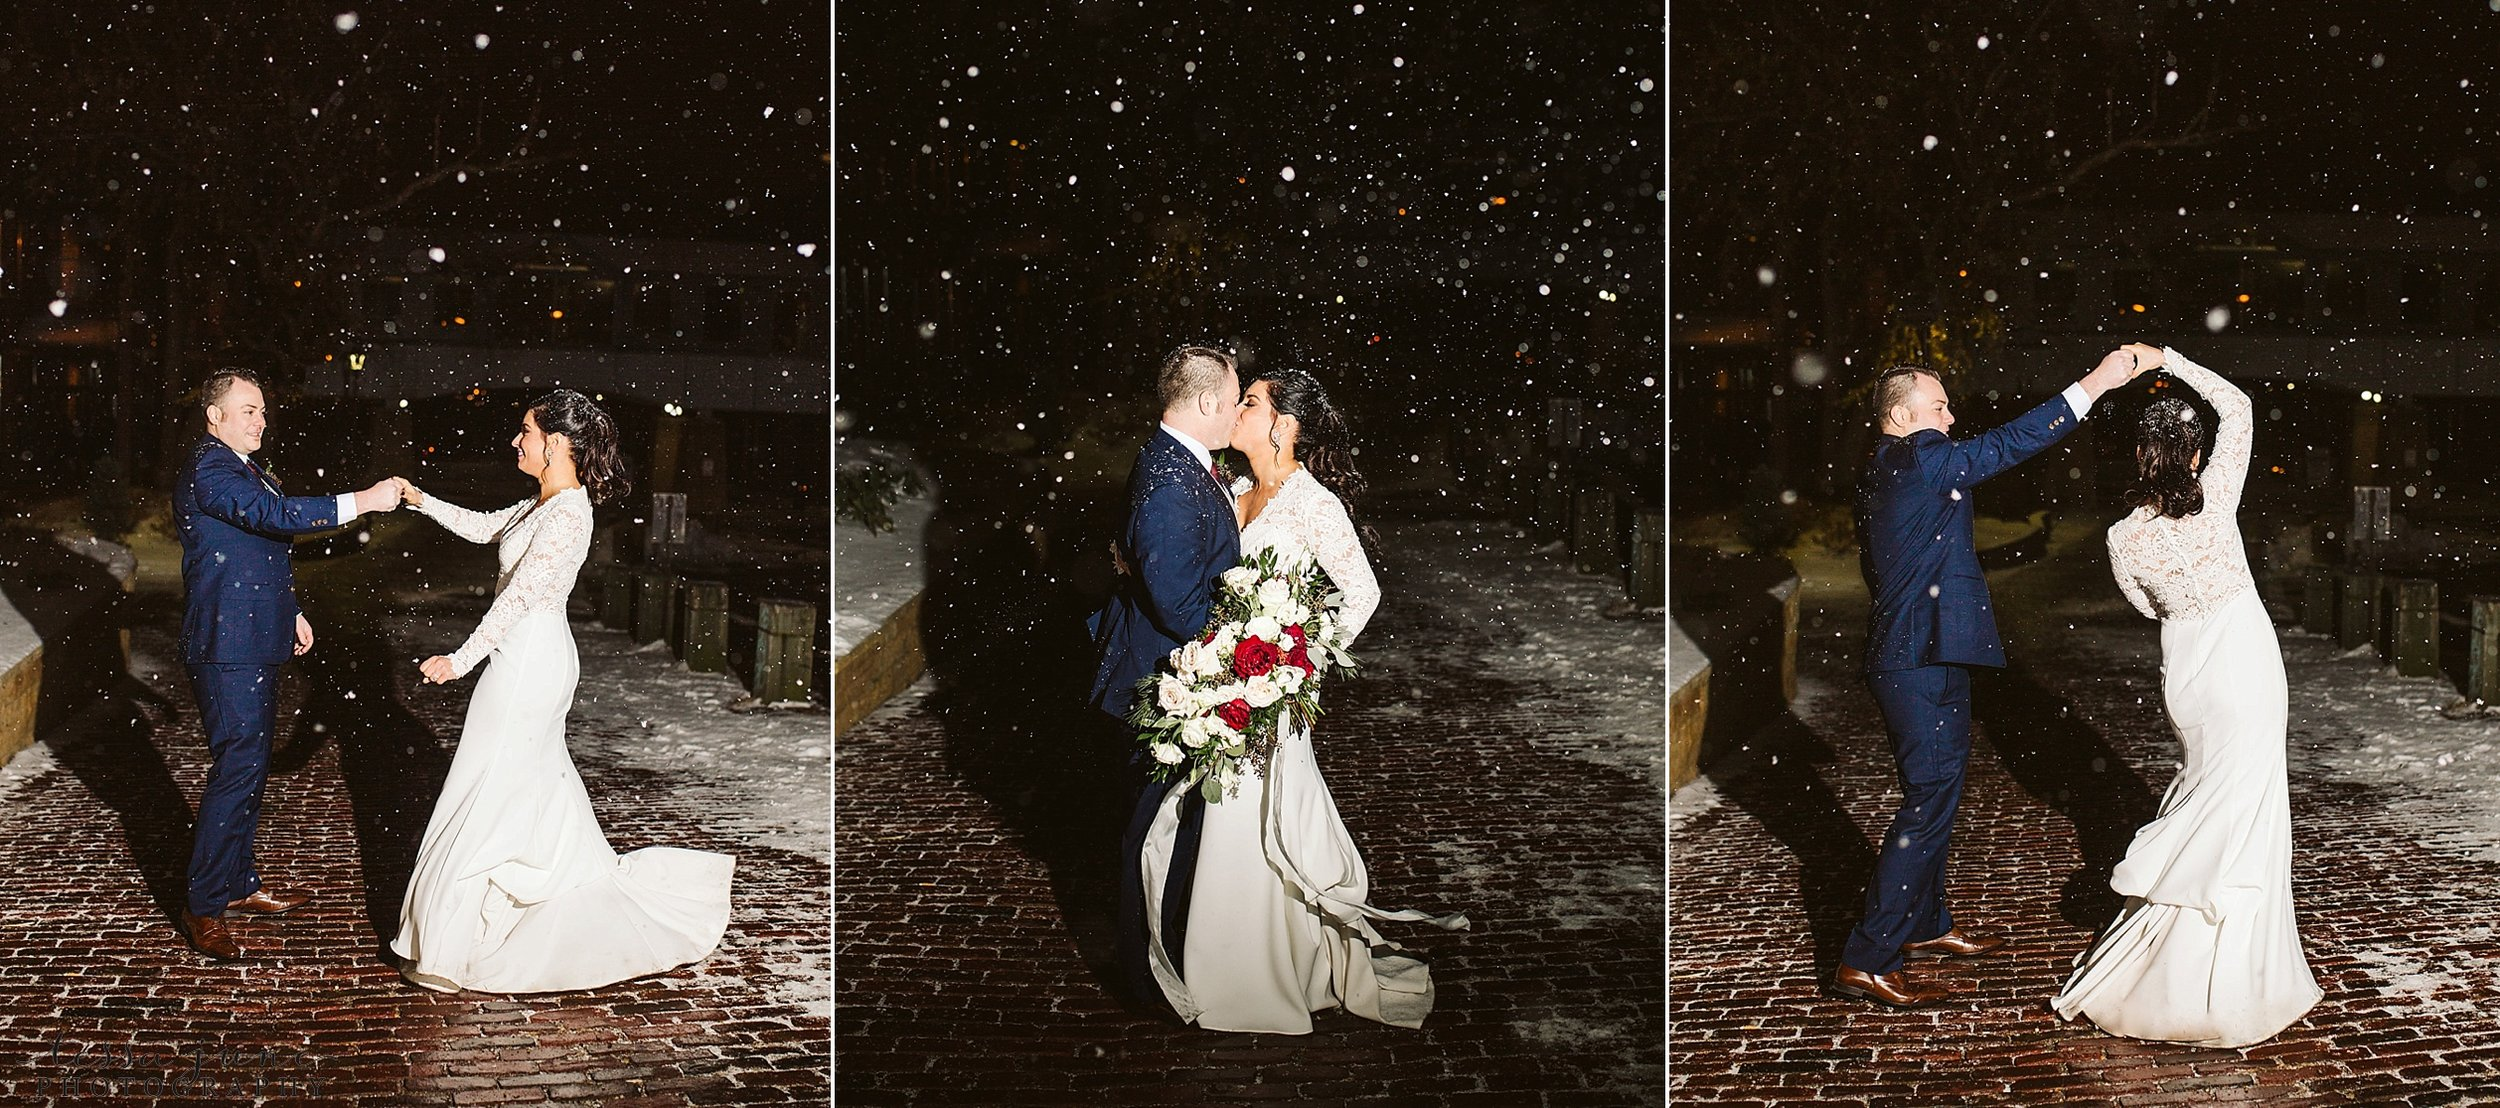 minneapolis-event-center-winter-romantic-snow-wedding-december-186.jpg